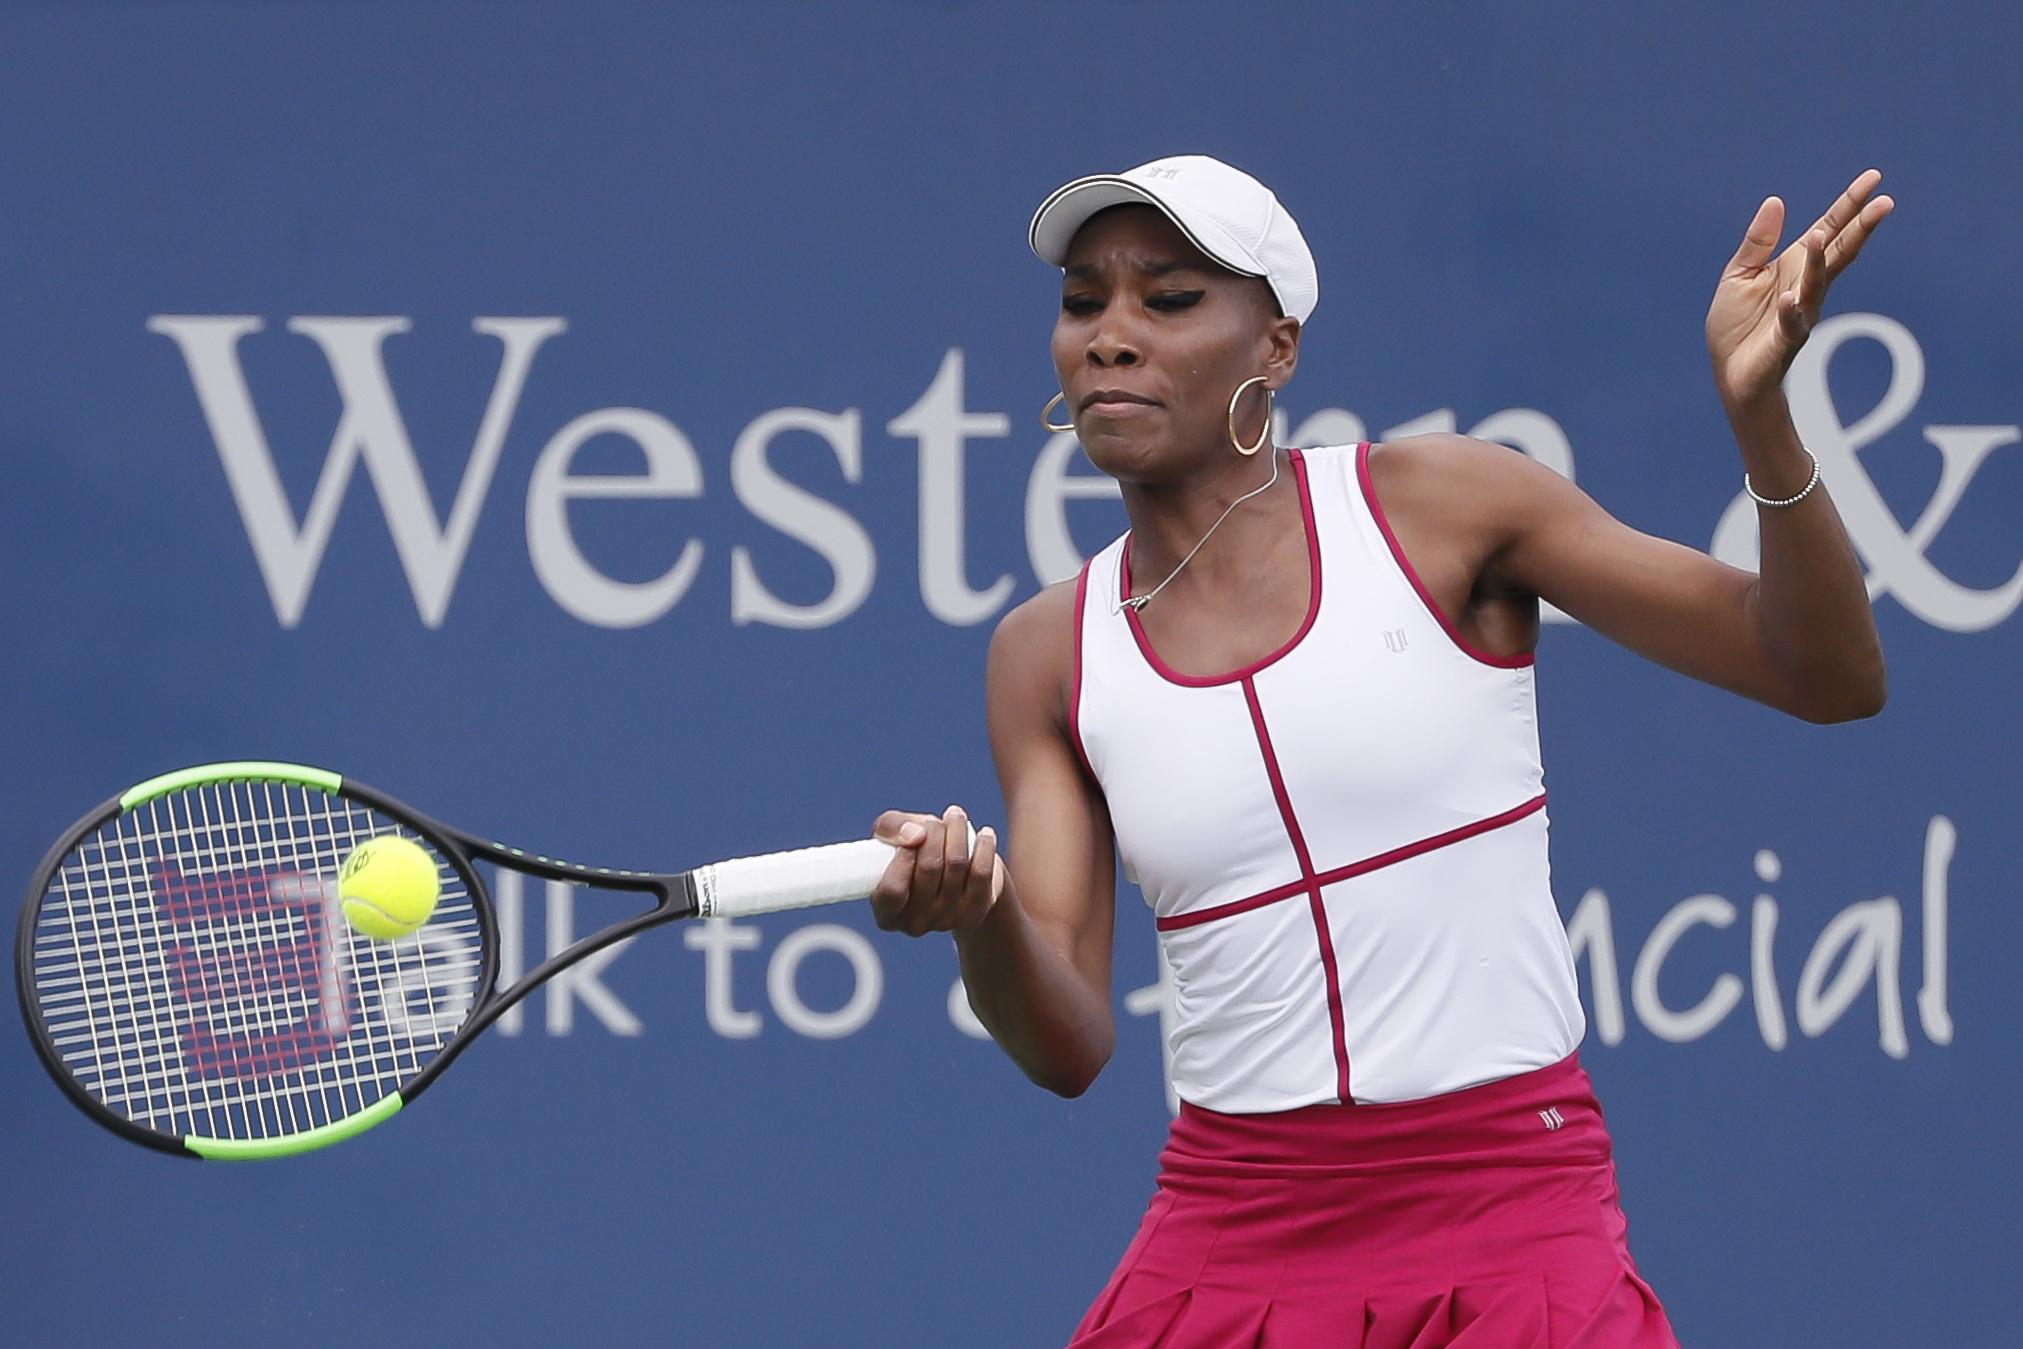 Venus Williams returns to Ashleigh Barty, of Australia, during the middle rounds at the Western & Southern Open tennis tournament, Wednesday, Aug. 16, 2017, in Mason, Ohio. (AP Photo/John Minchillo)